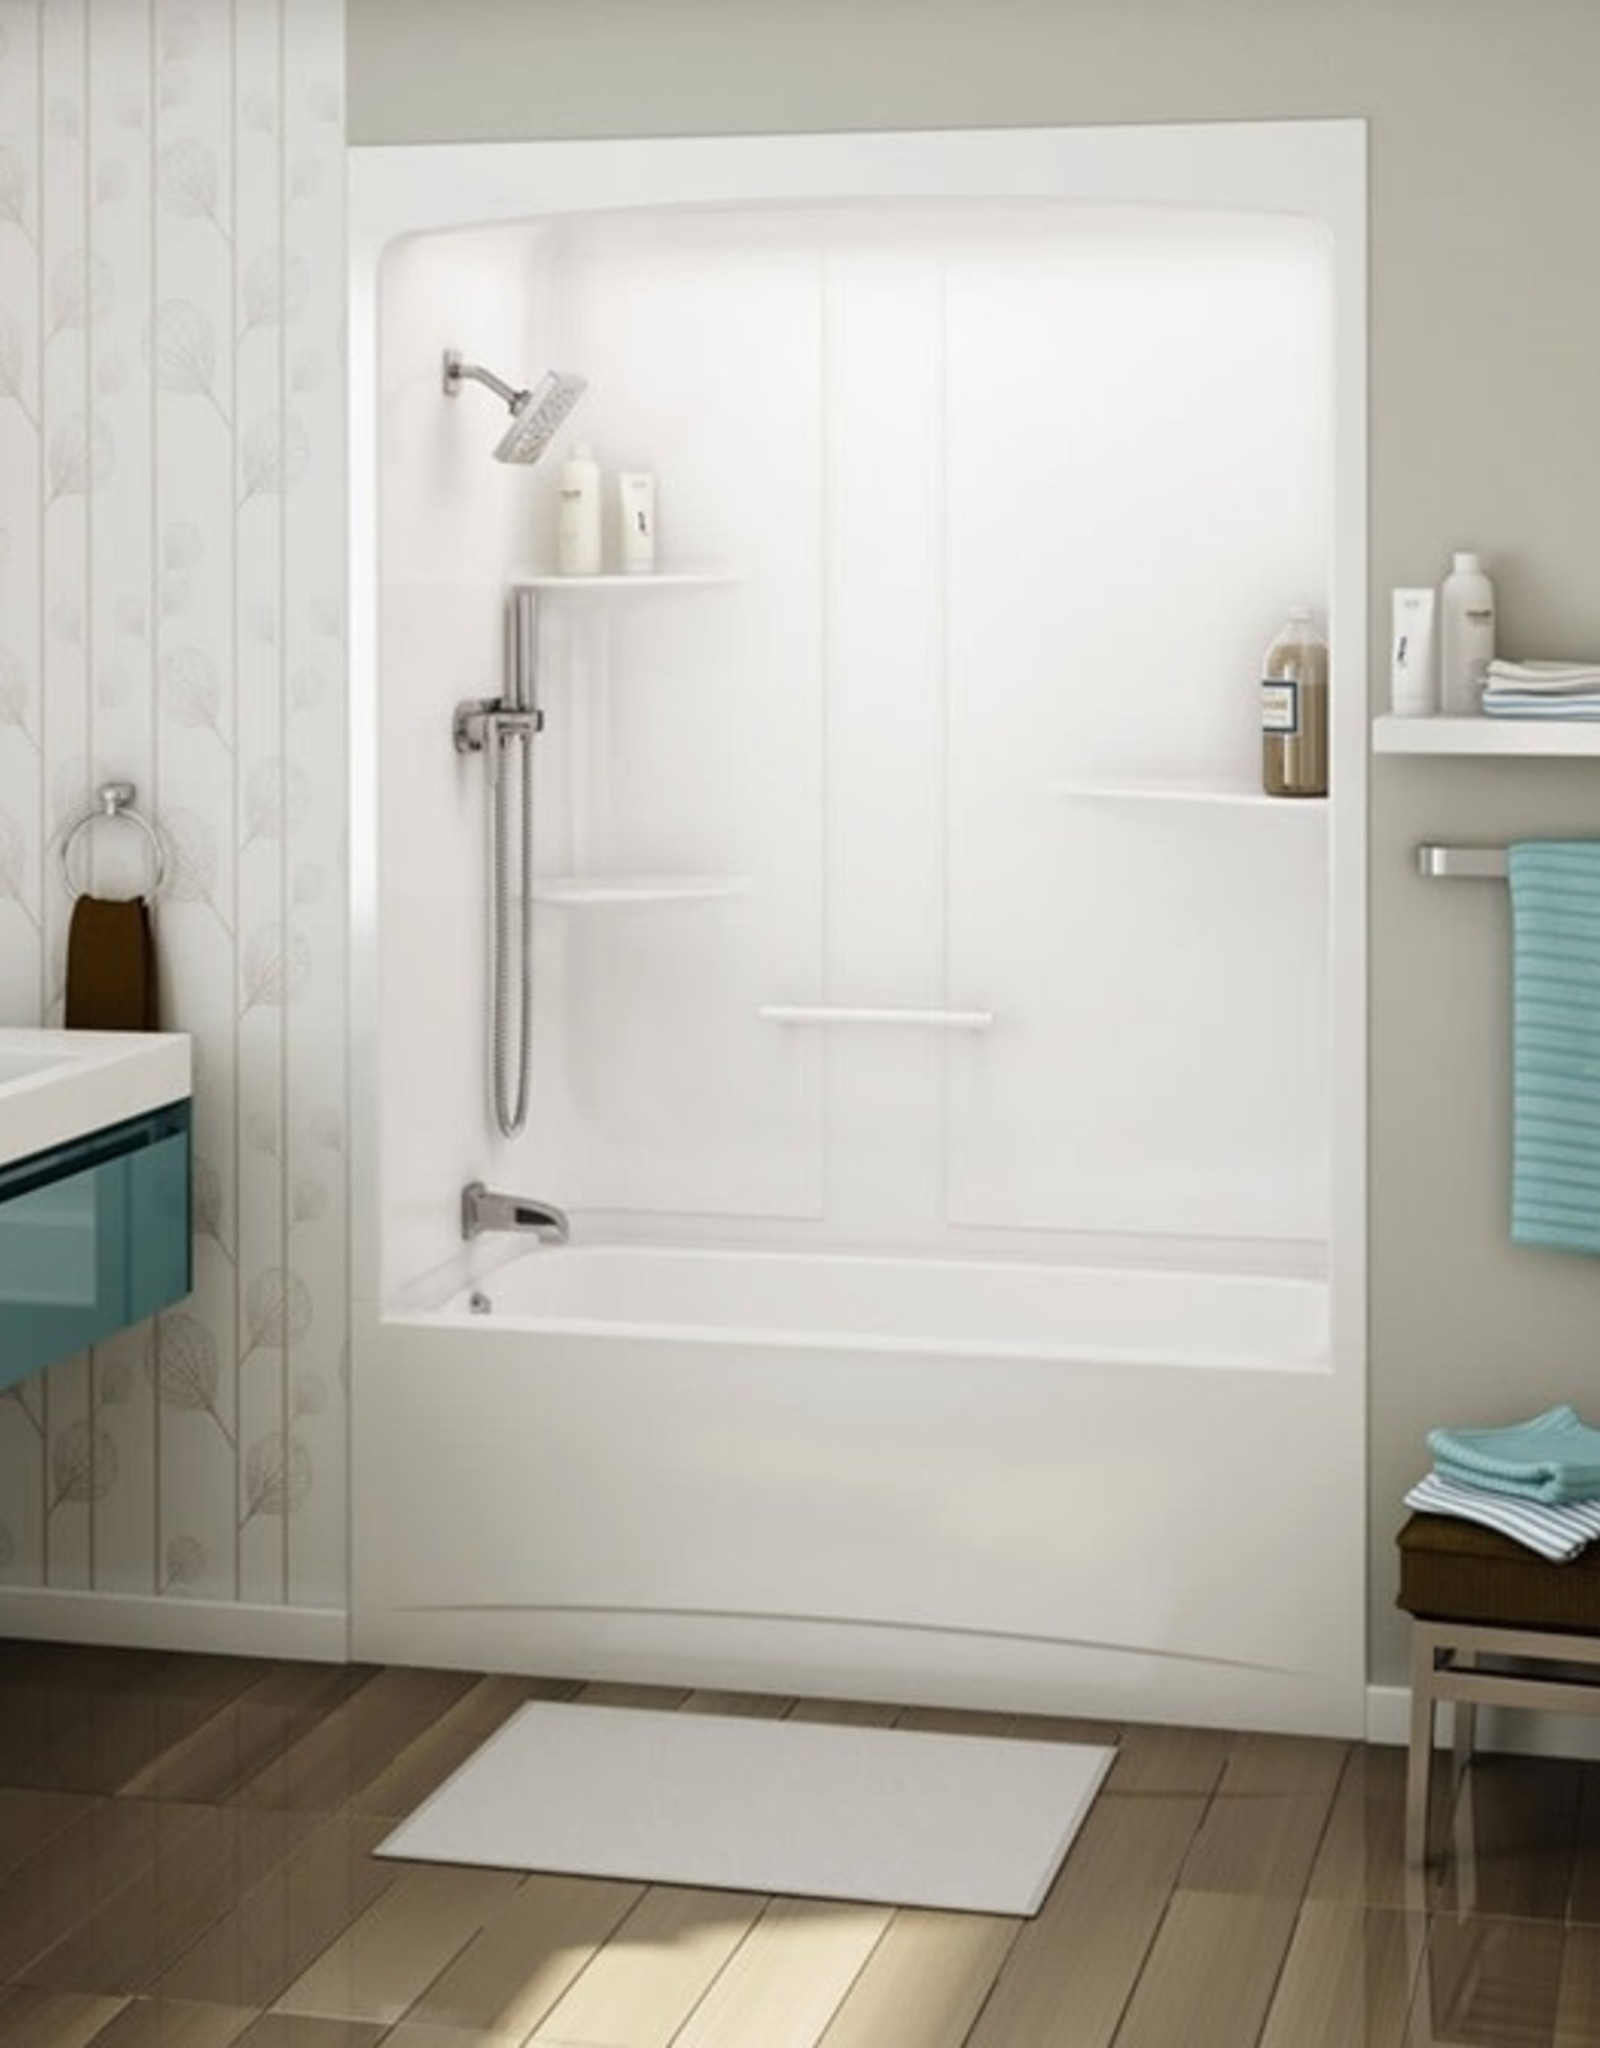 Maax Allia 1-Piece Tub/Shower 60x32 RD